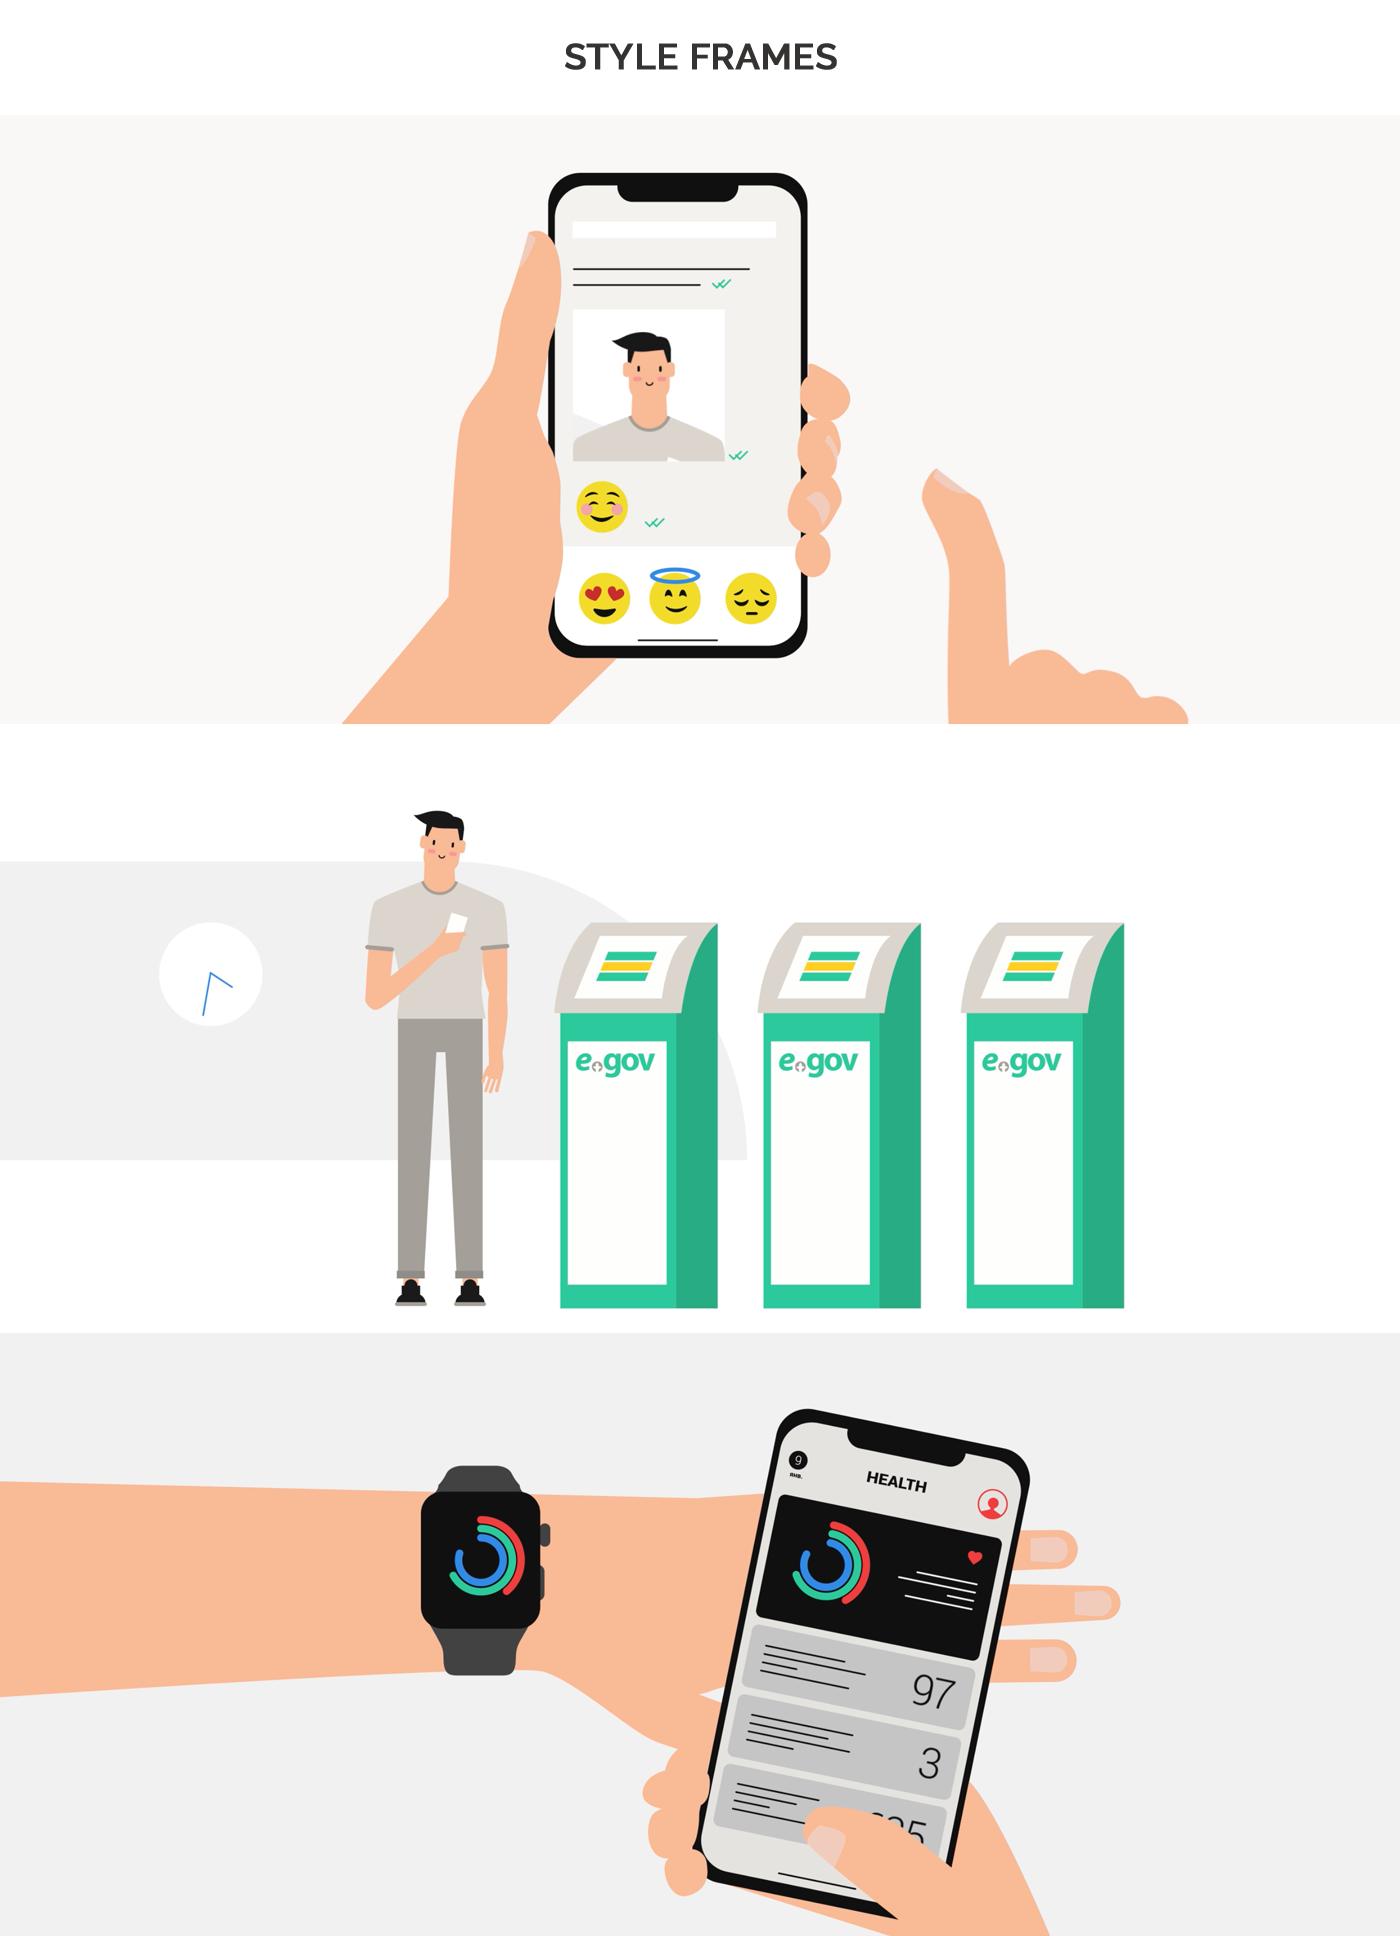 digital vr Virtual reality smartphone iphonex iphone apple